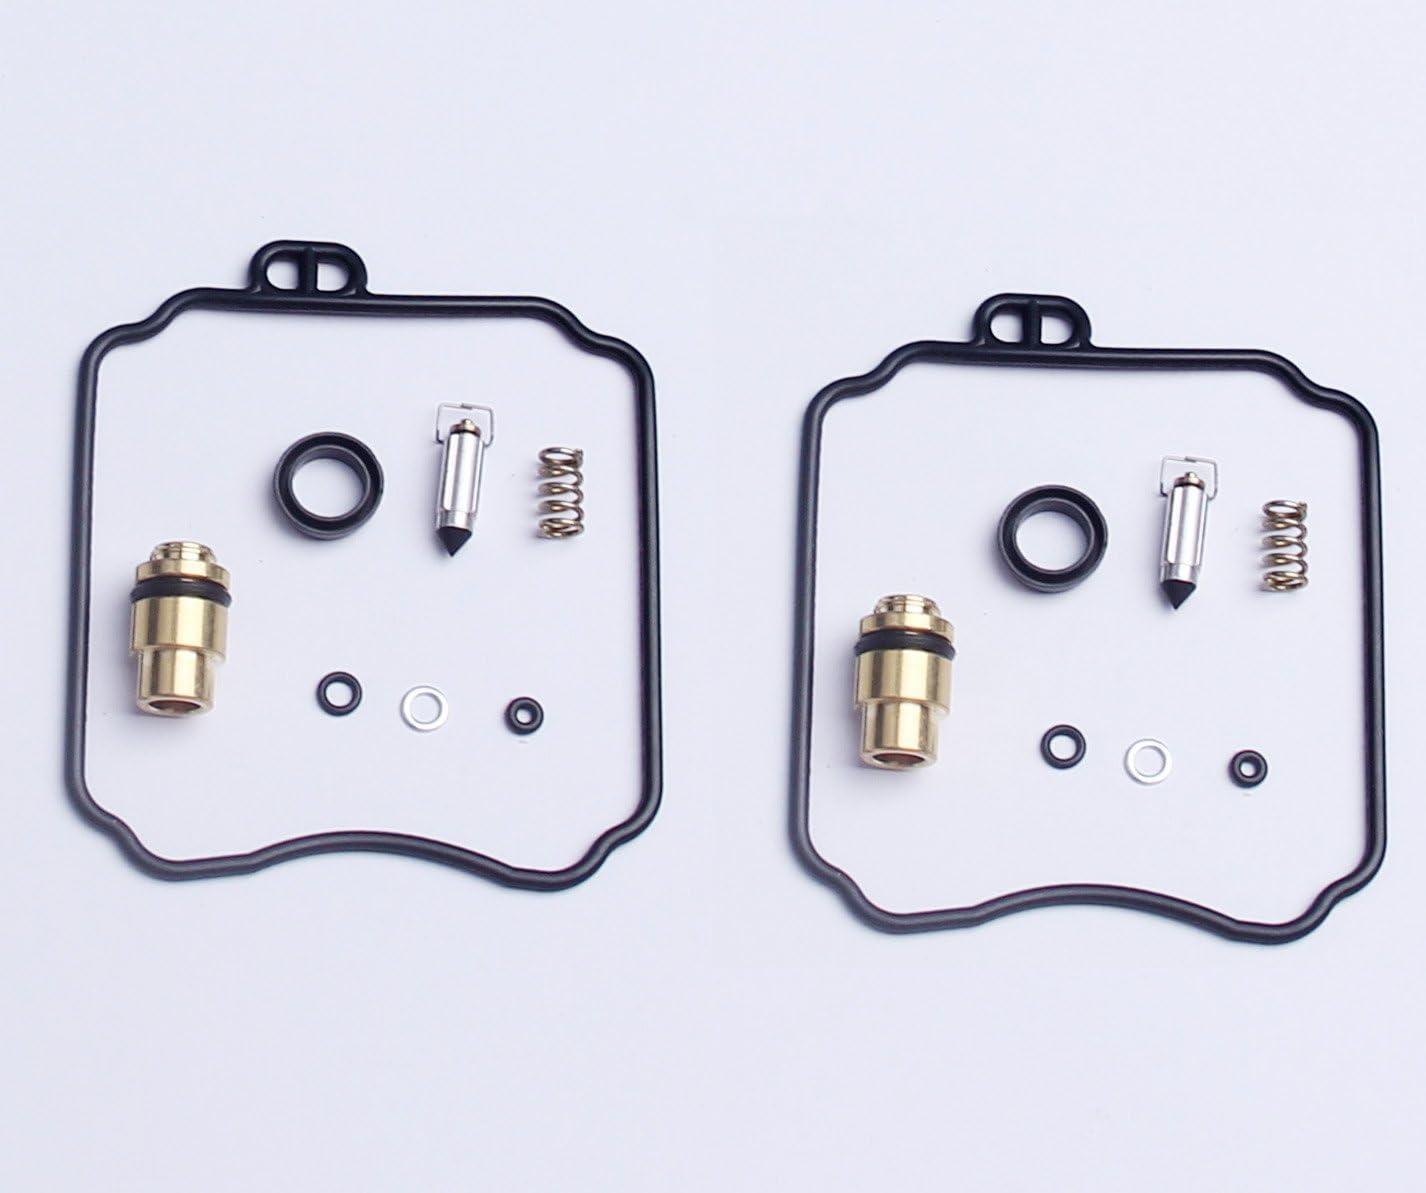 1 Yamaha XV250 2 Sets Carburetor Carb Repair Rebuild Kits Yamaha XV250 Virago XVS650 V-Star 18-5171